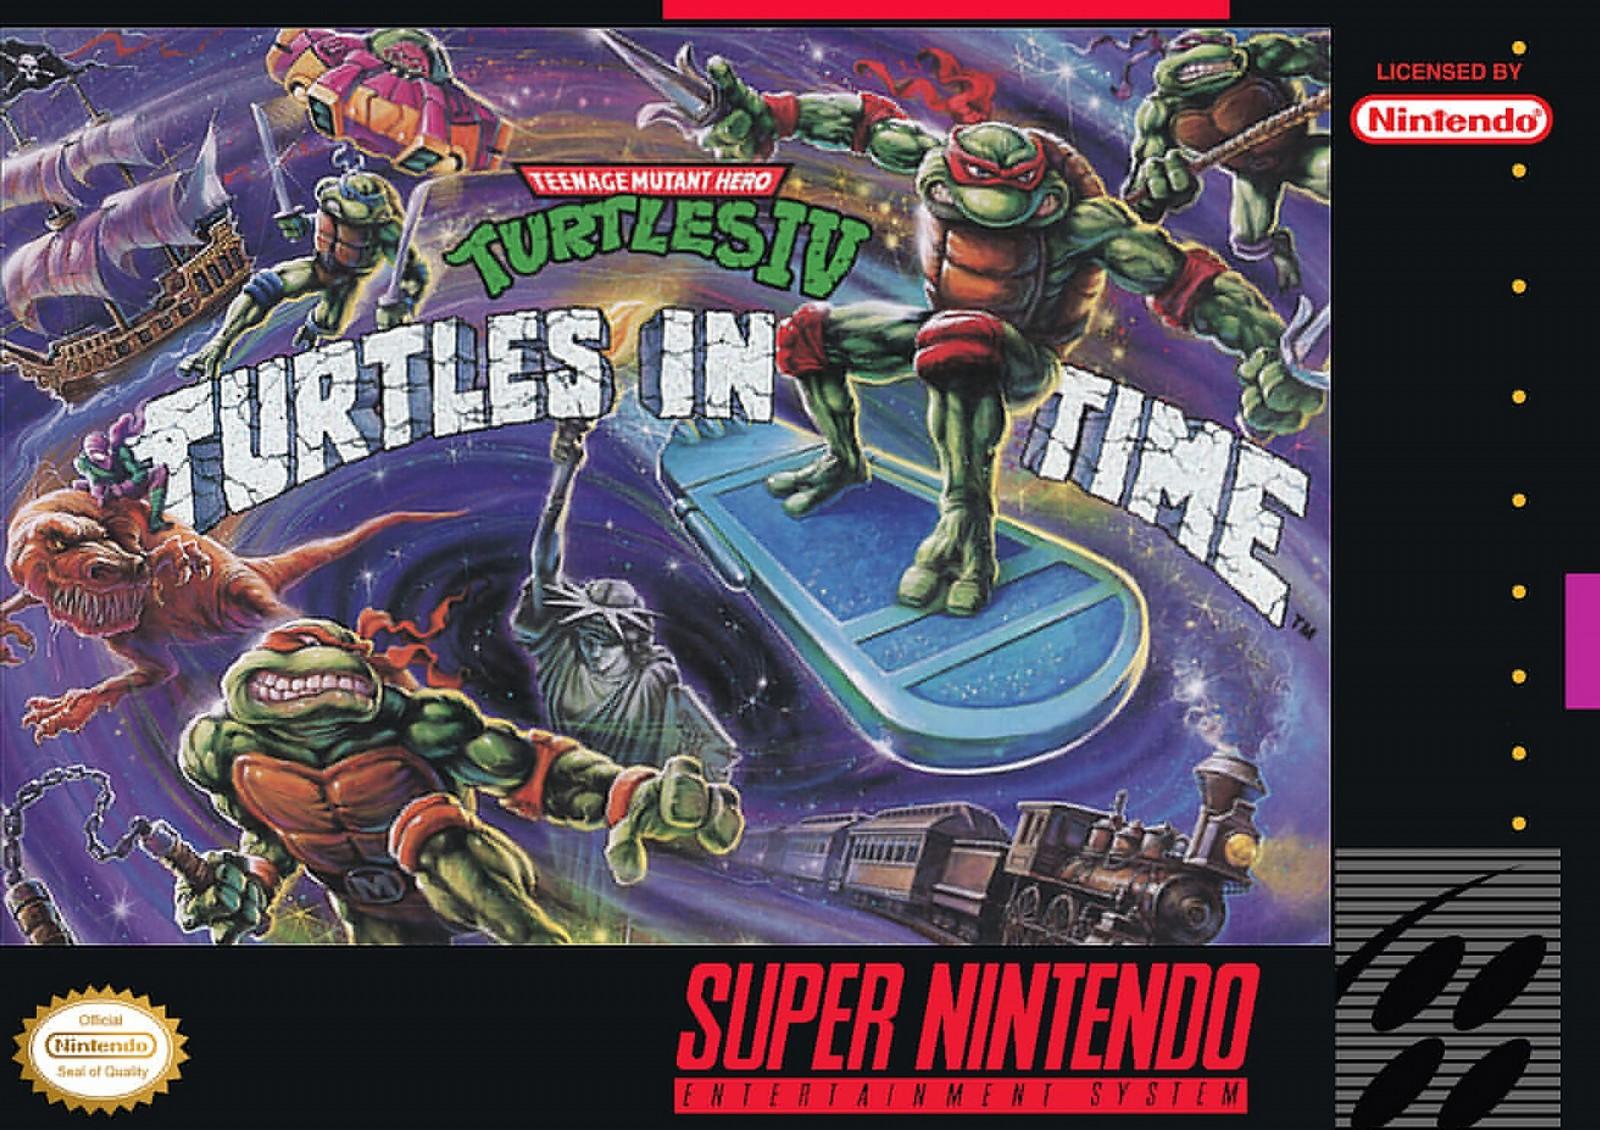 Teenage Mutant Ninja Turtles: Turtles in Time for Super Nintendo.